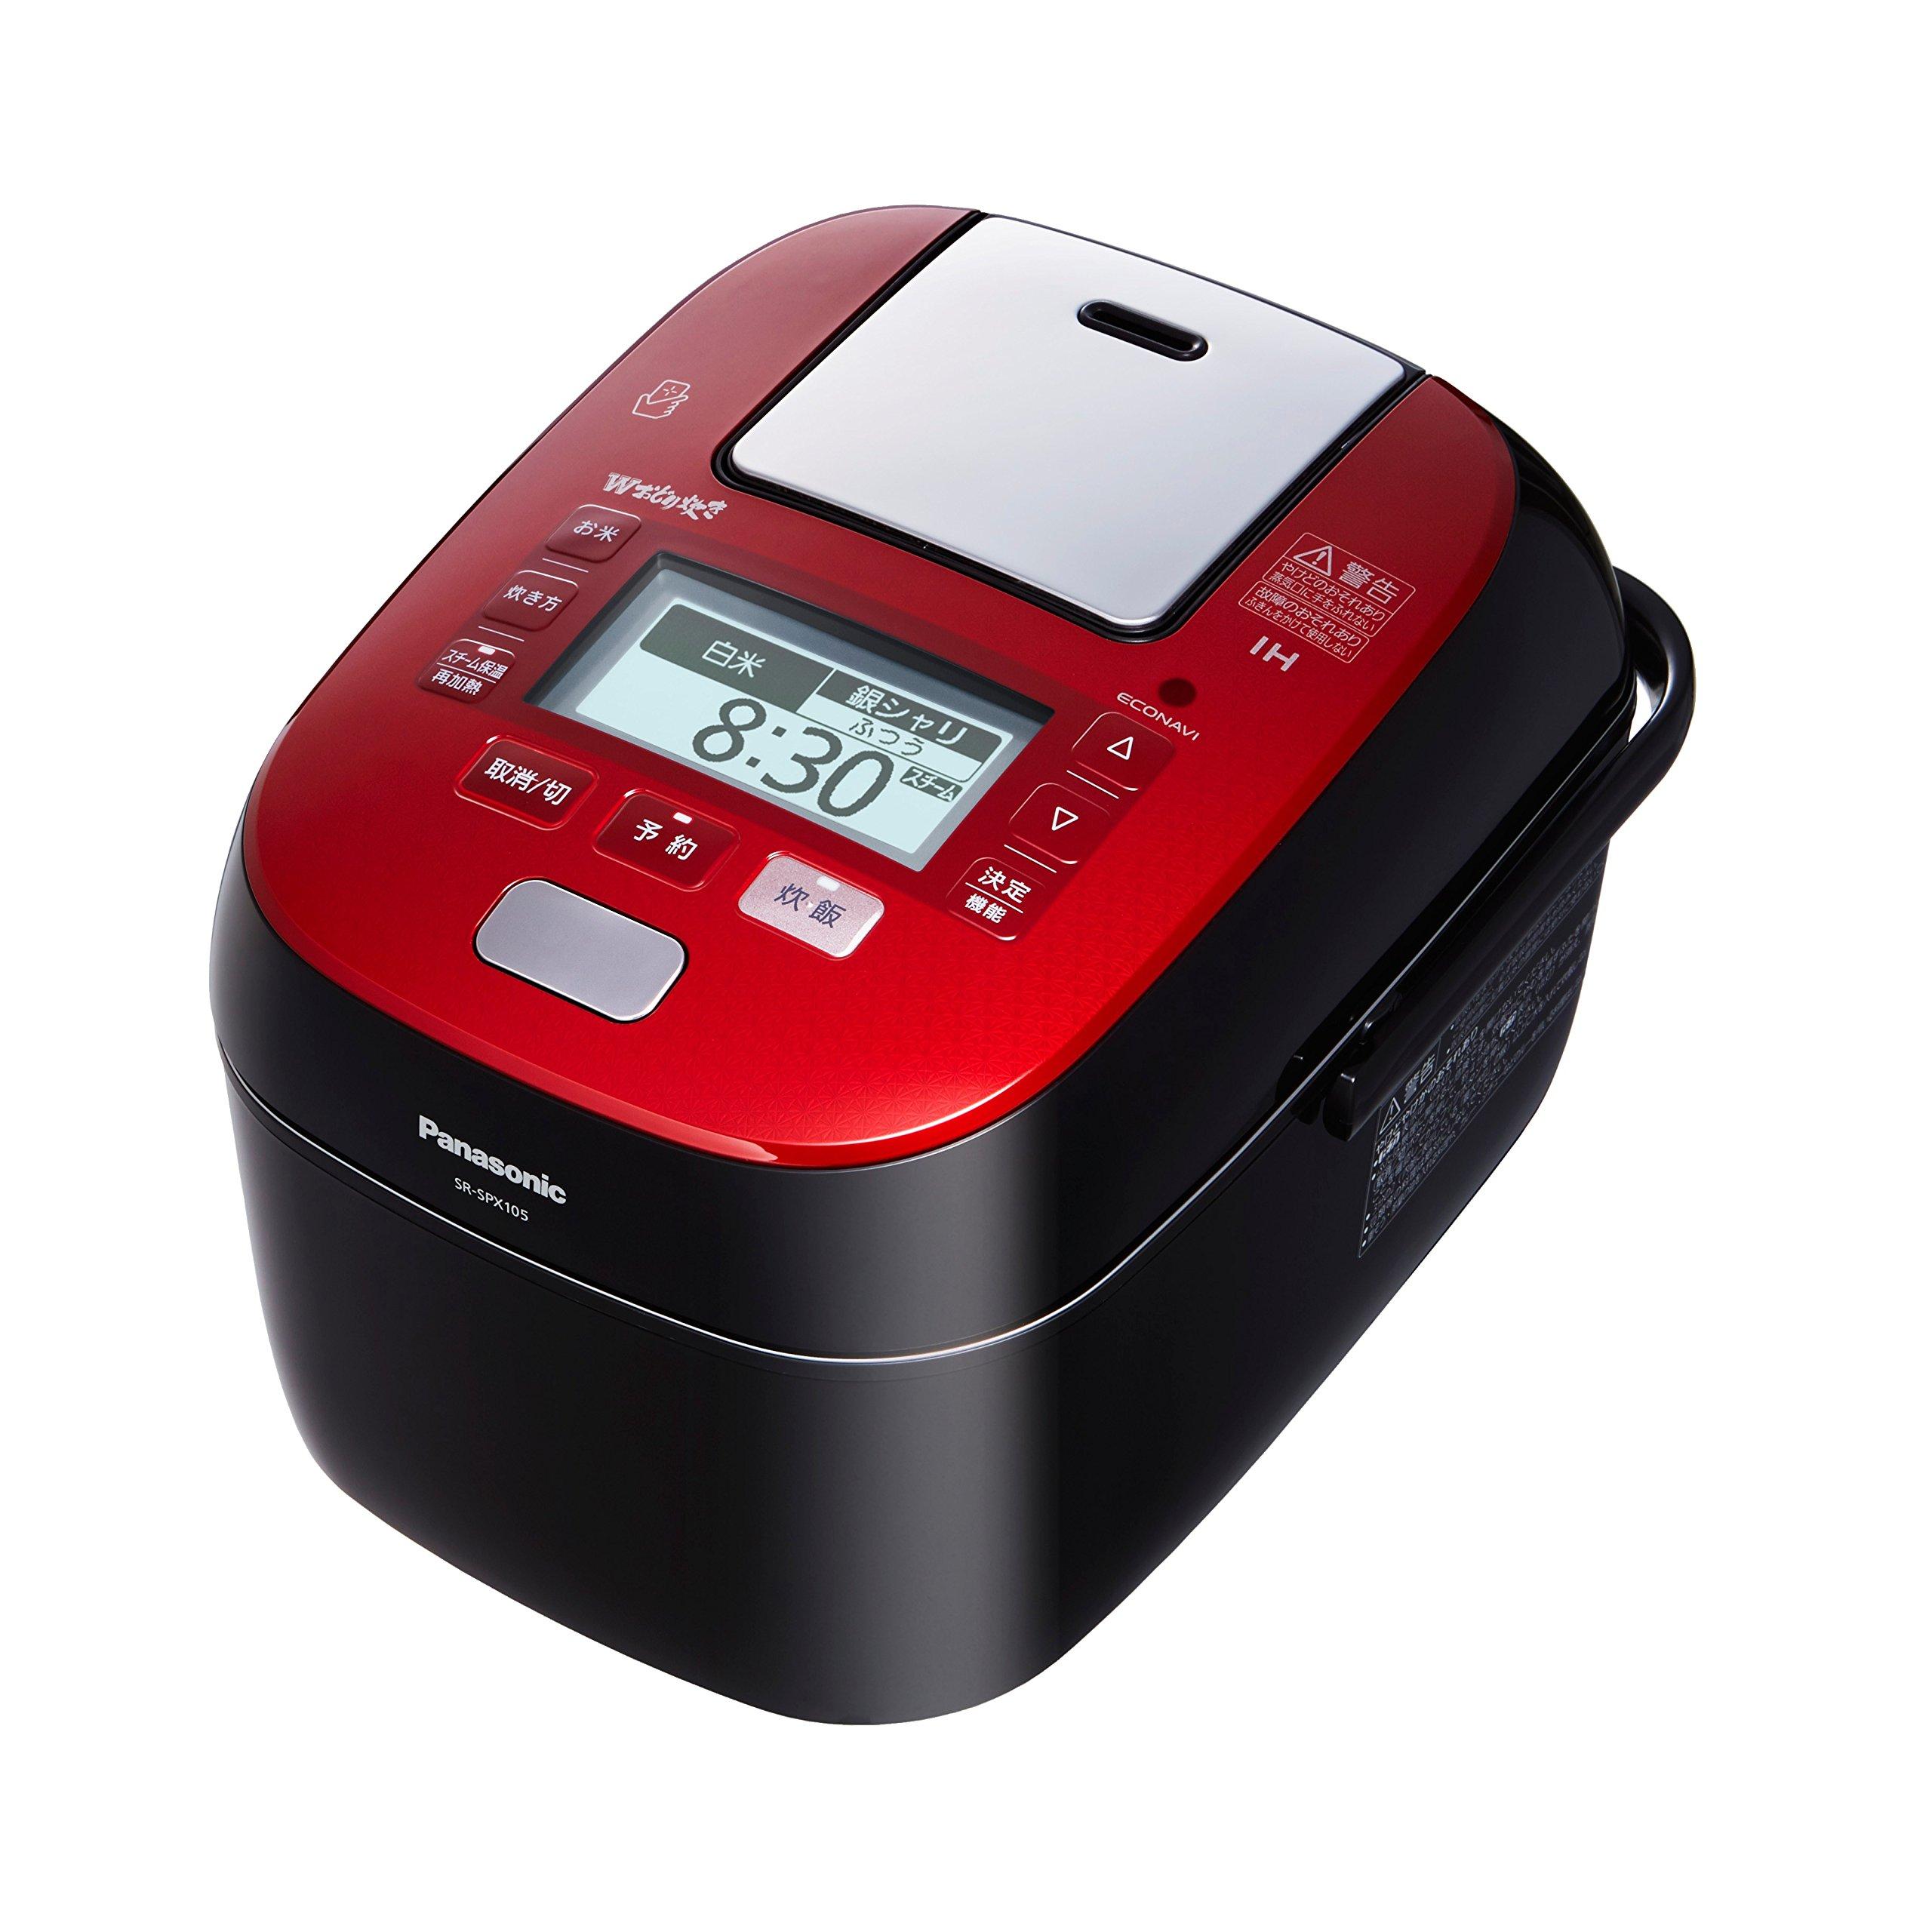 Panasonic W dance cook steam and variable pressure IH jar rice machine 1.0L 0.5 ~ 5.5 Go Rouge Black SR-SPX105-RK